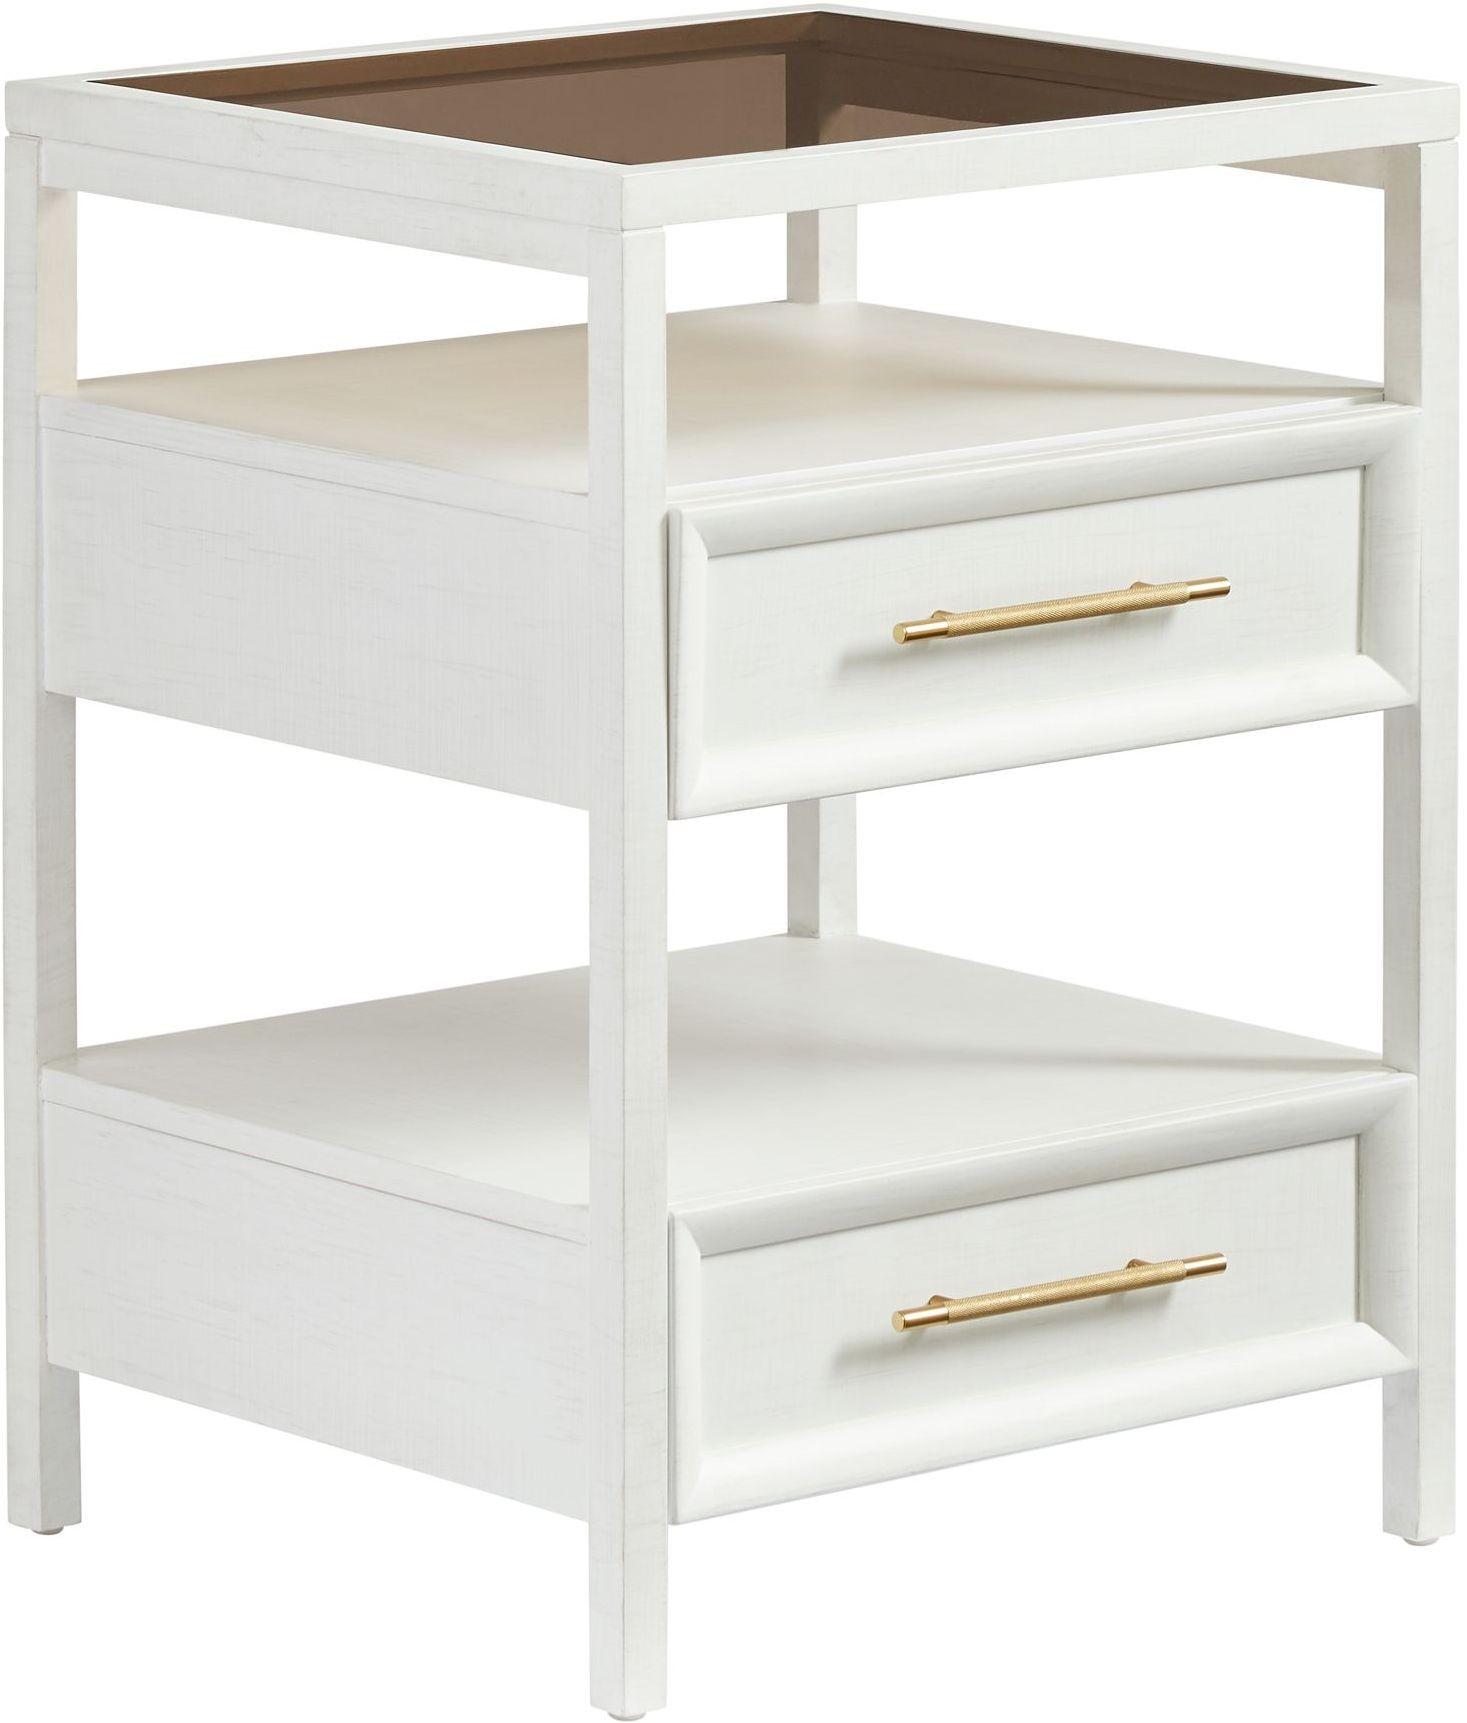 archetype furniture. Panavista Alabaster Archetype Telephone Table Furniture L